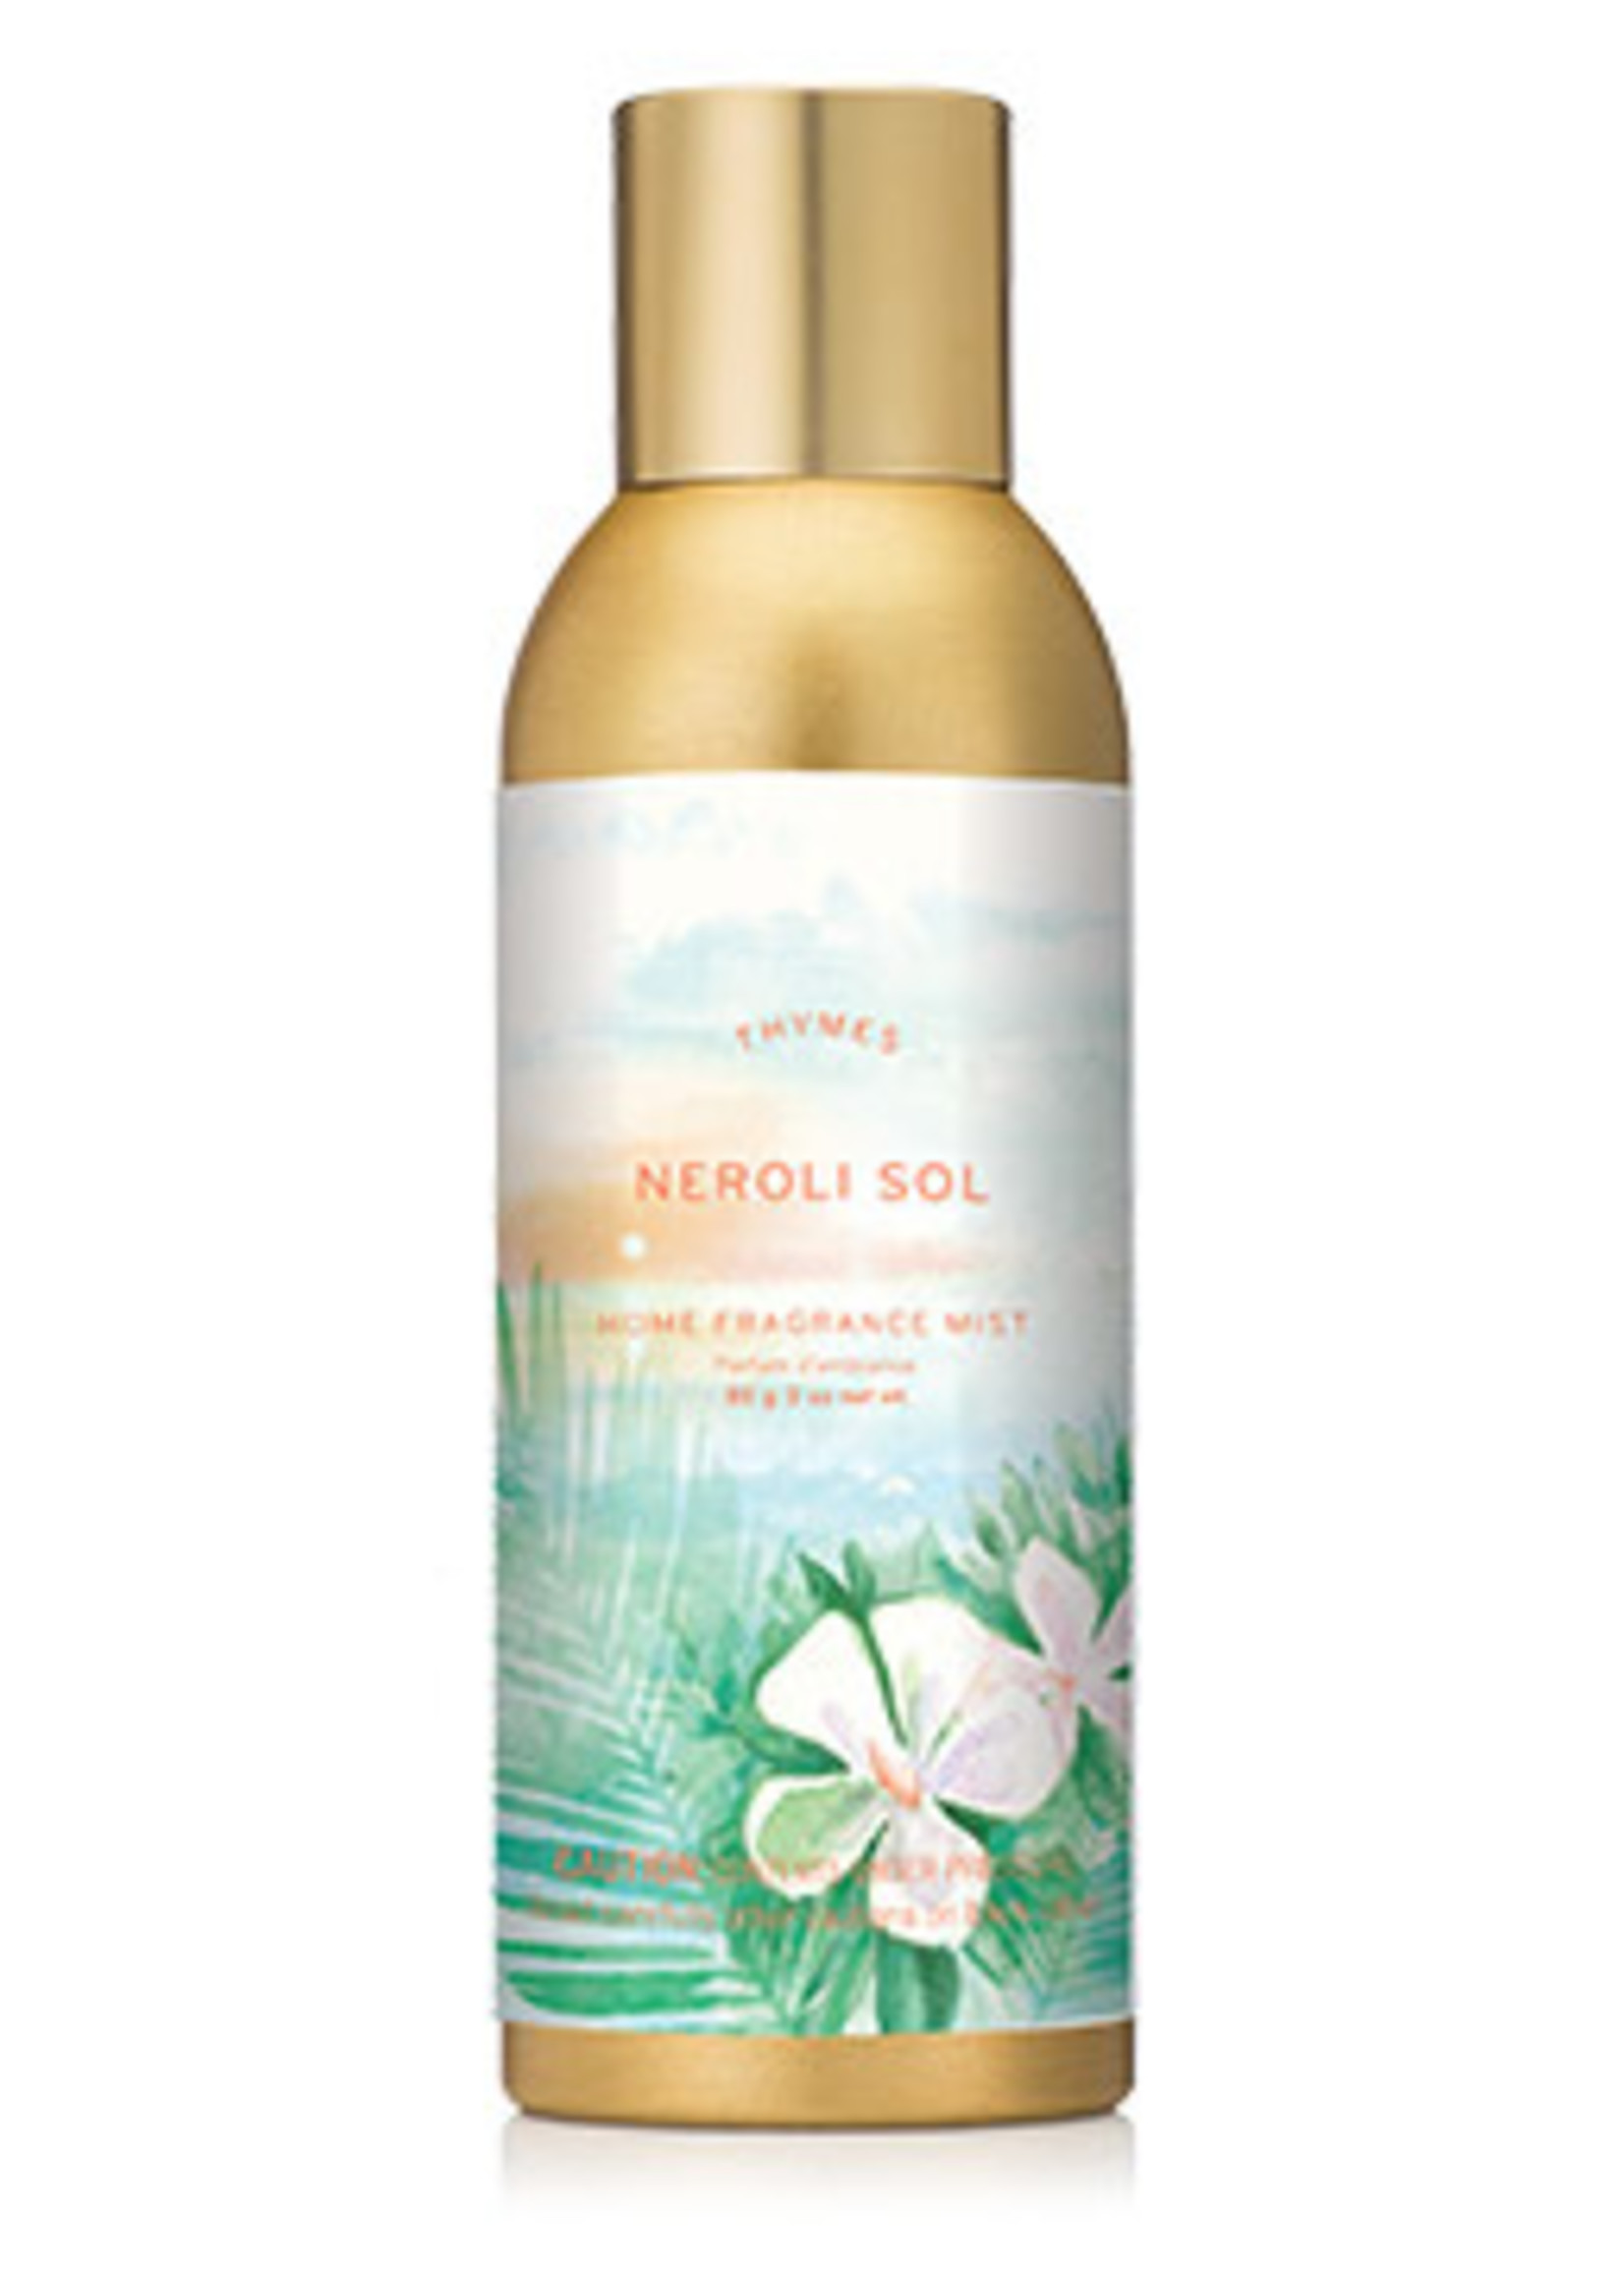 Thymes Neroli Sol Home Fragrance Mist